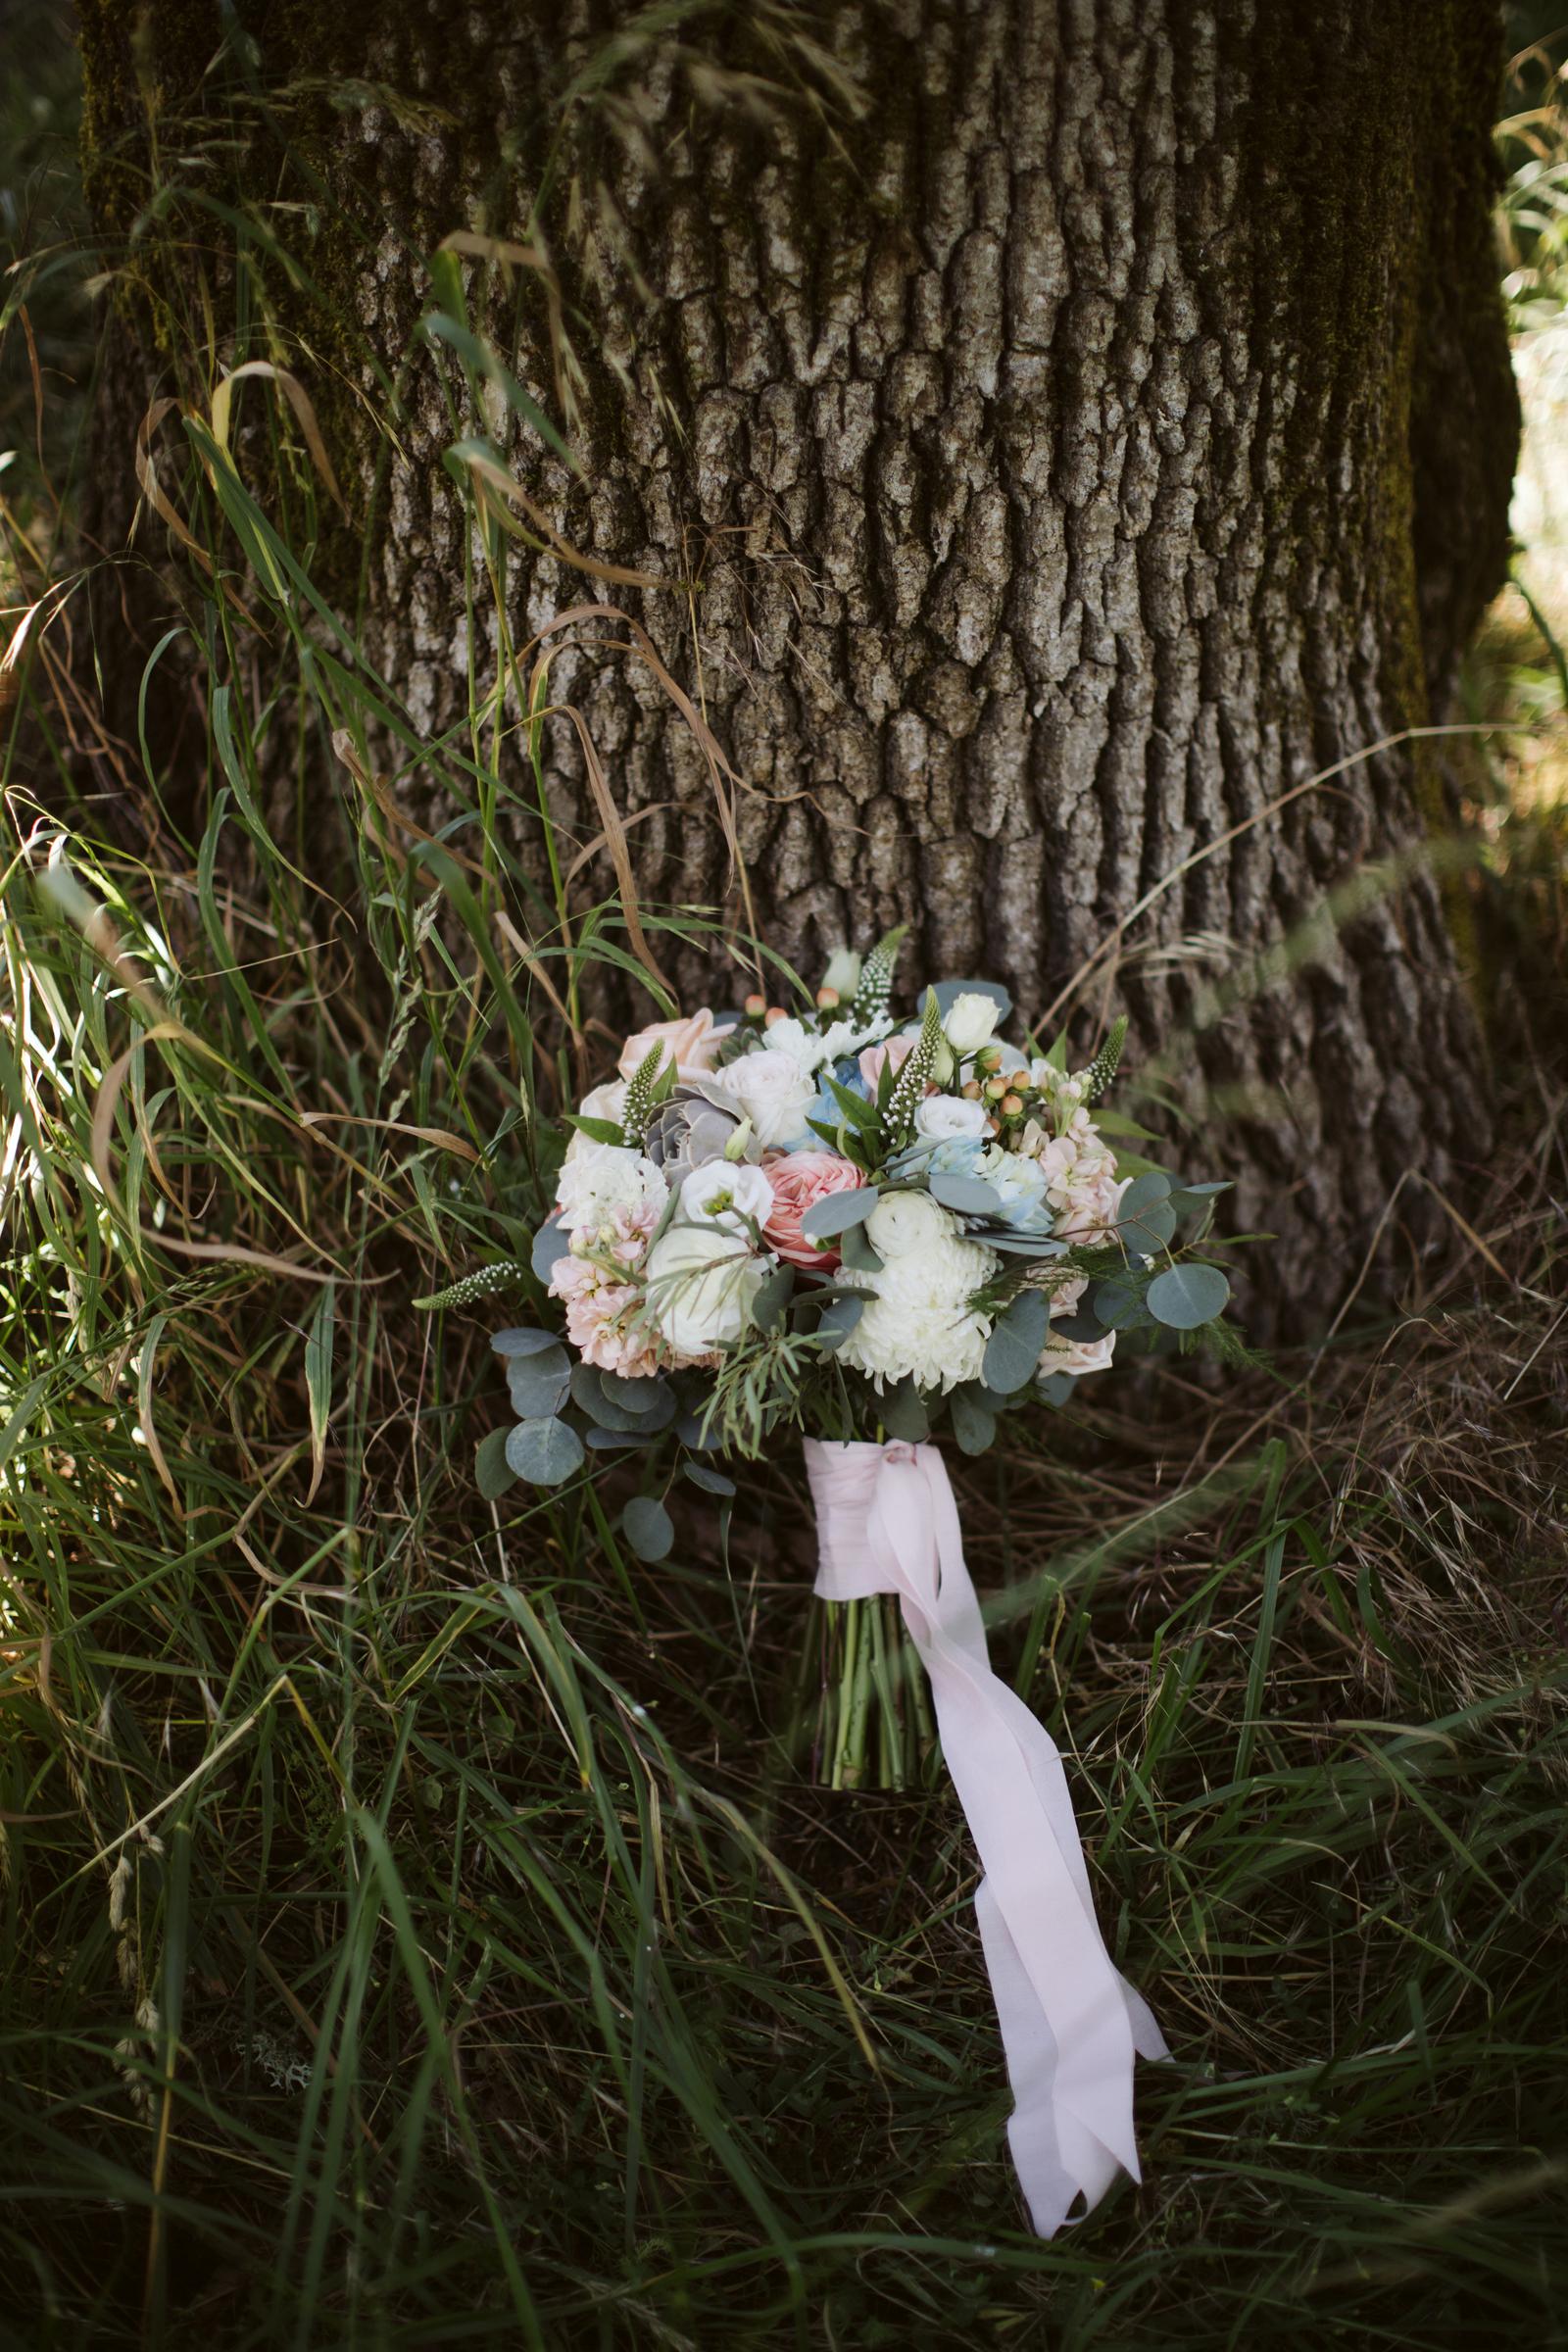 024-daronjackson-rachel-michael-wedding-mtpisgah.jpg